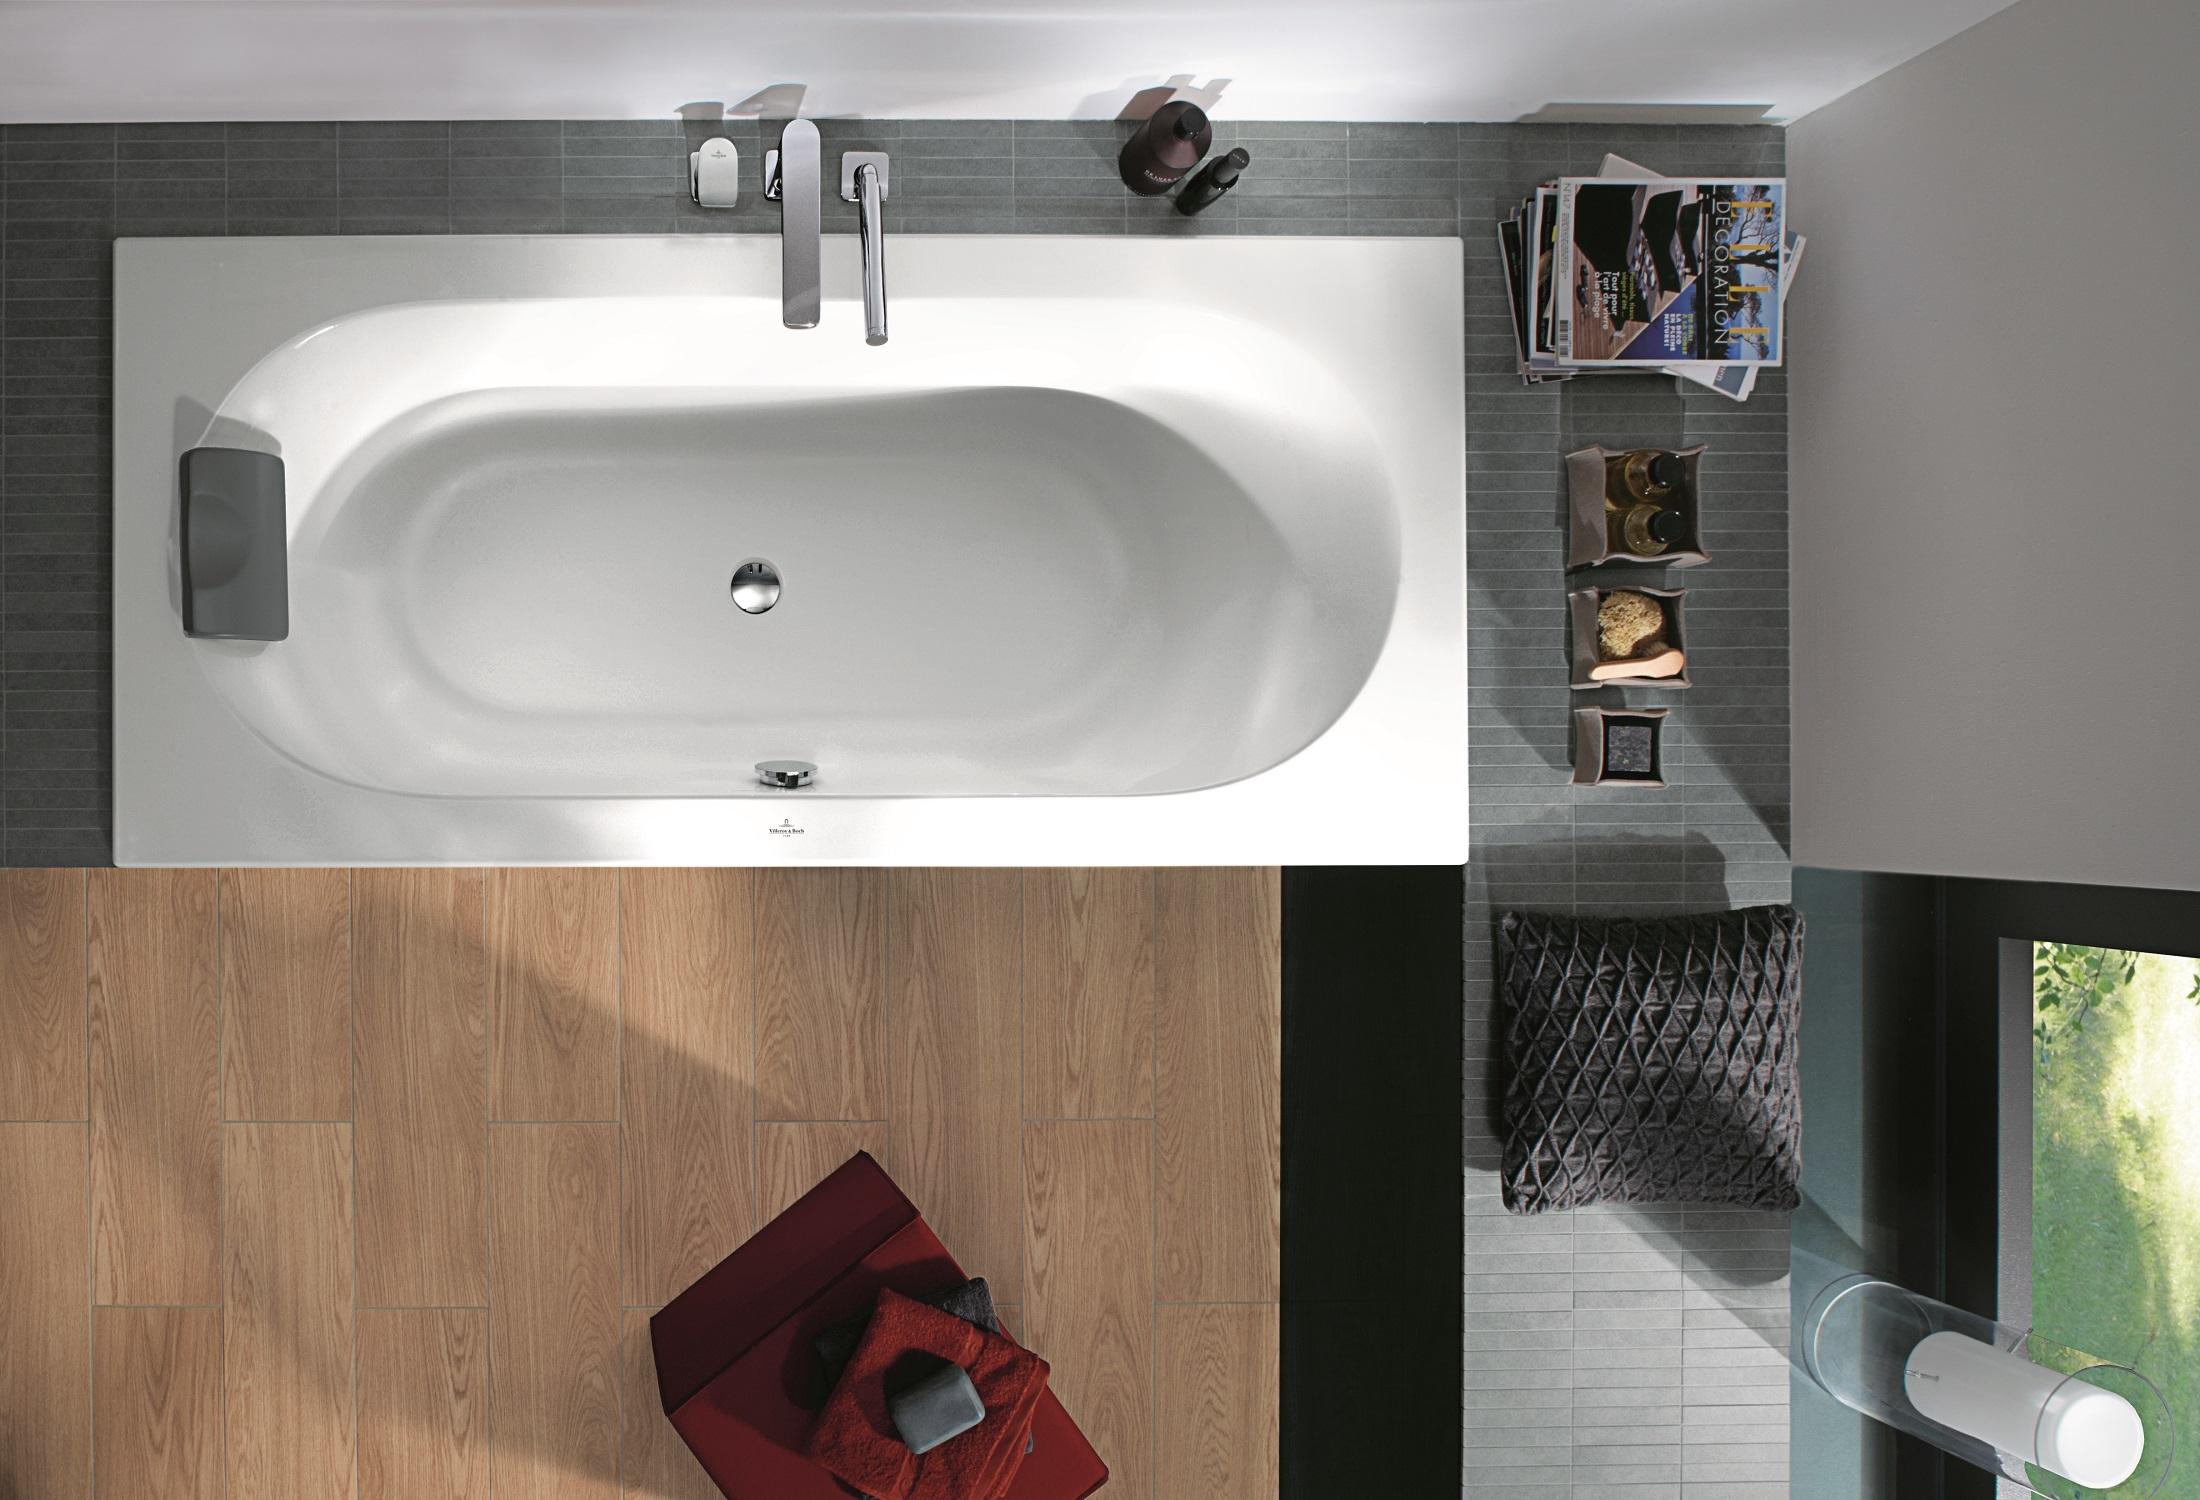 badewanne rechteckig loop friends von villeroy boch. Black Bedroom Furniture Sets. Home Design Ideas